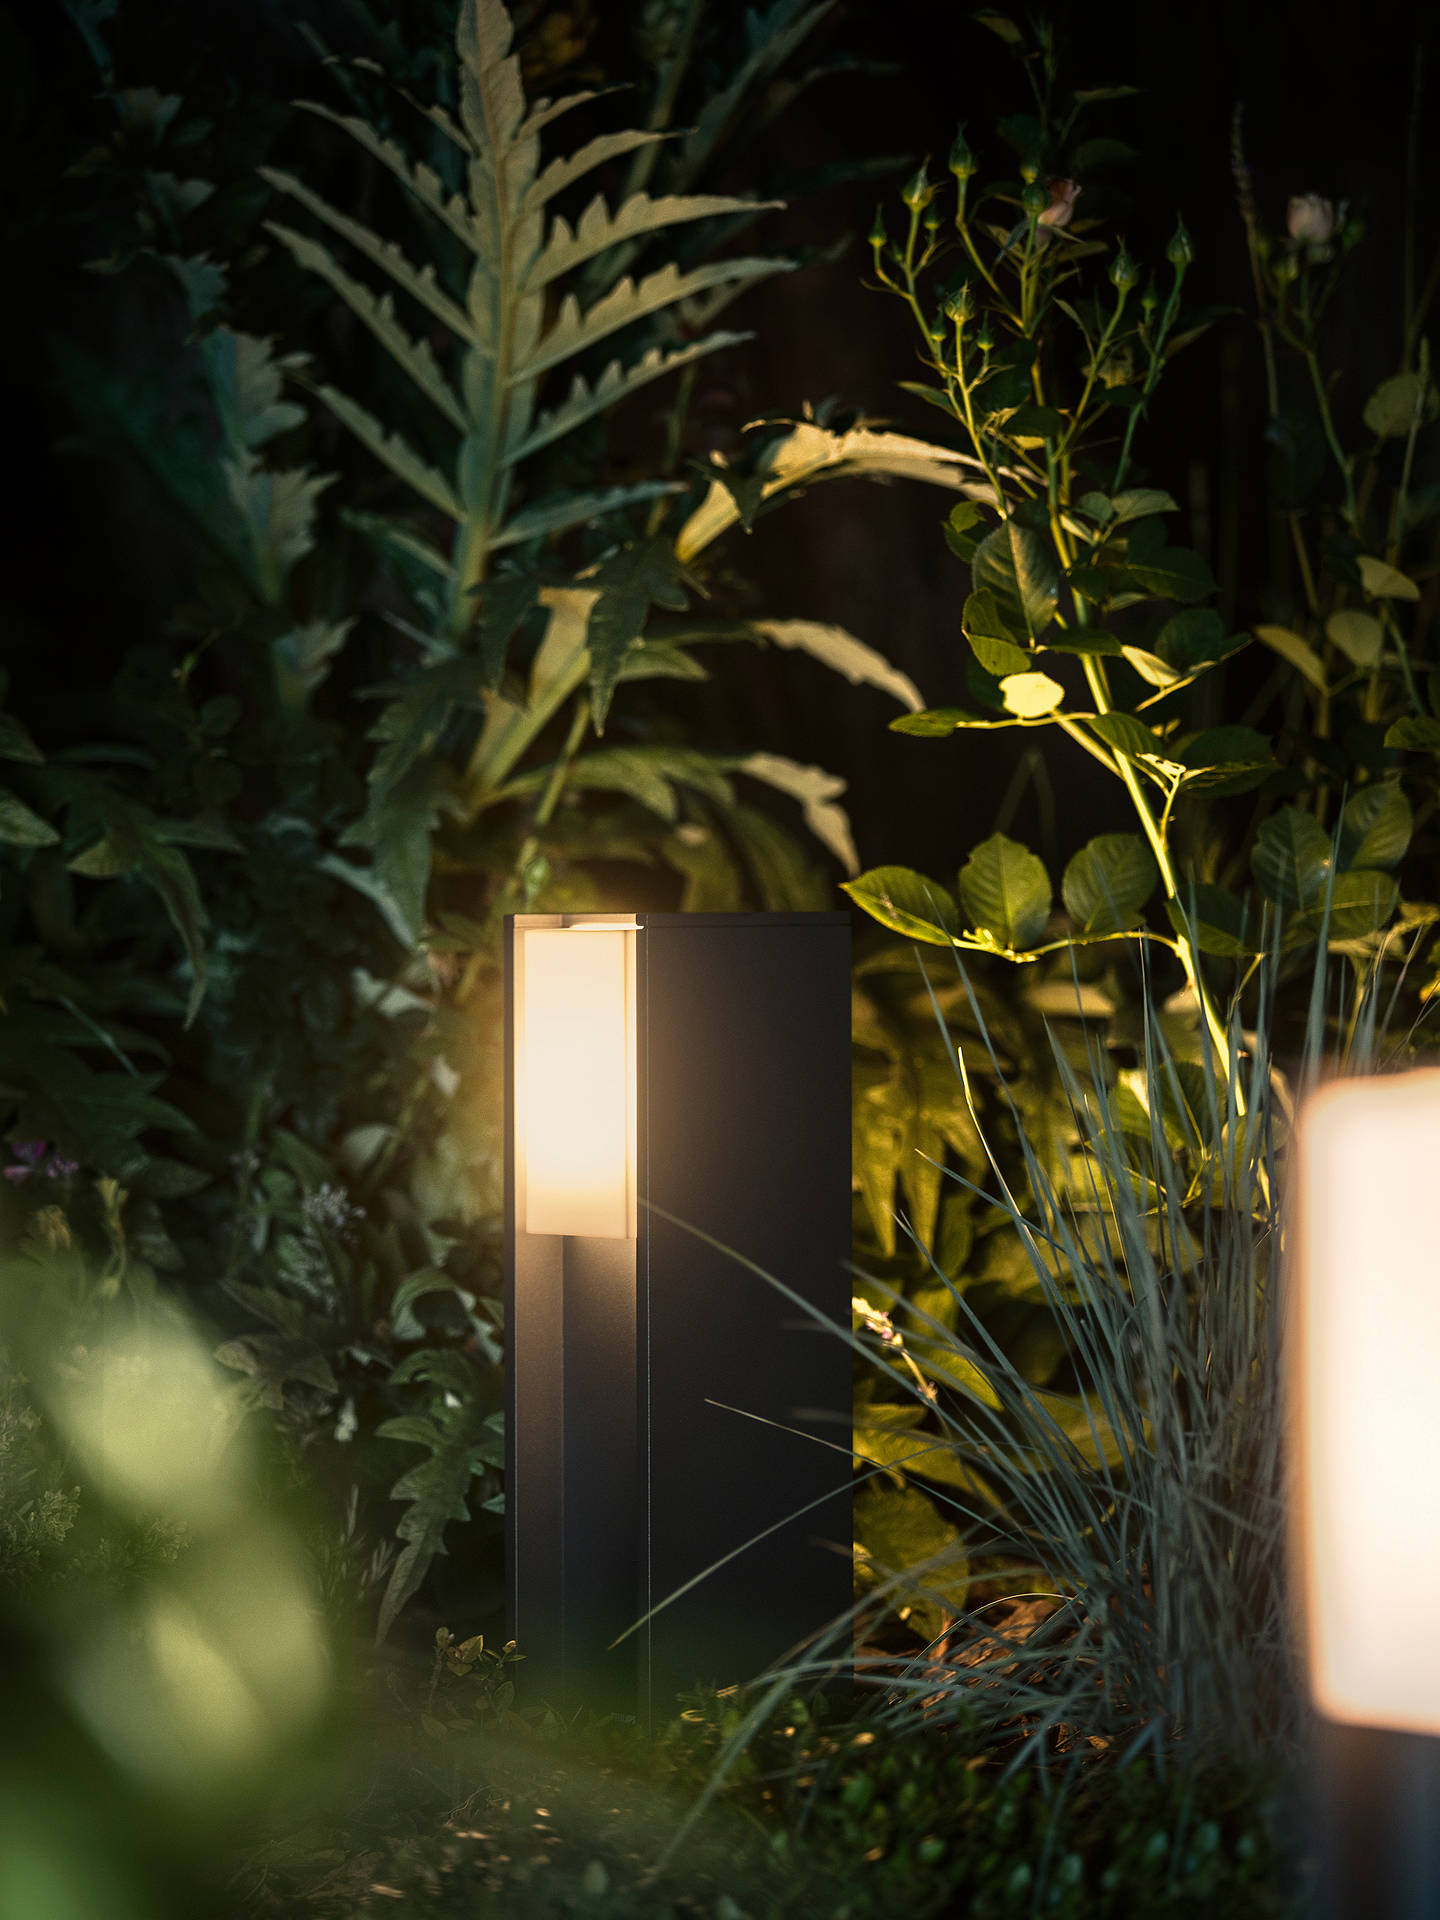 Philips Hue Turaco Led Outdoor Light Black